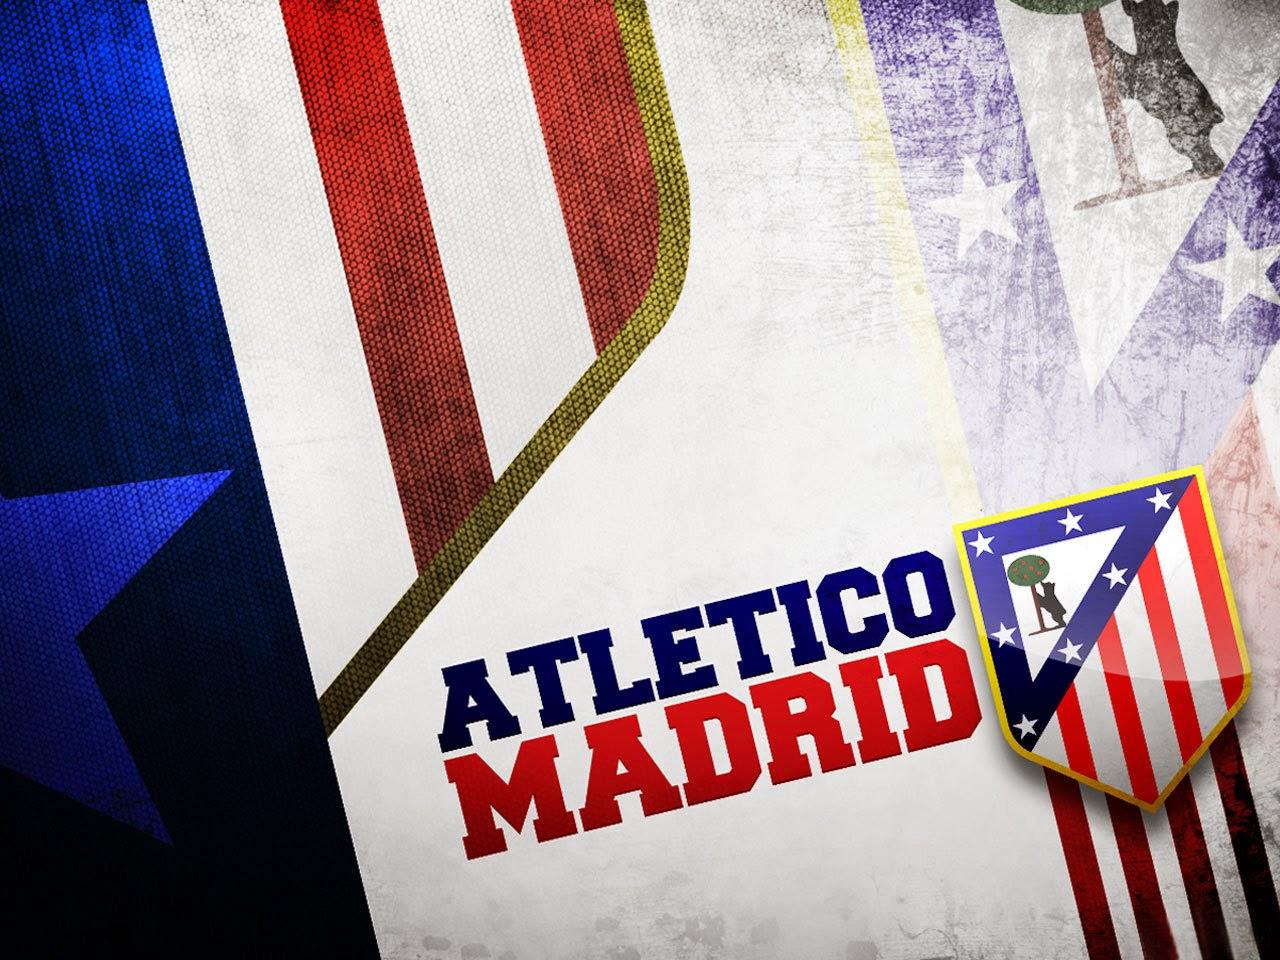 Atletico Madrid Wallpaper 1280x960